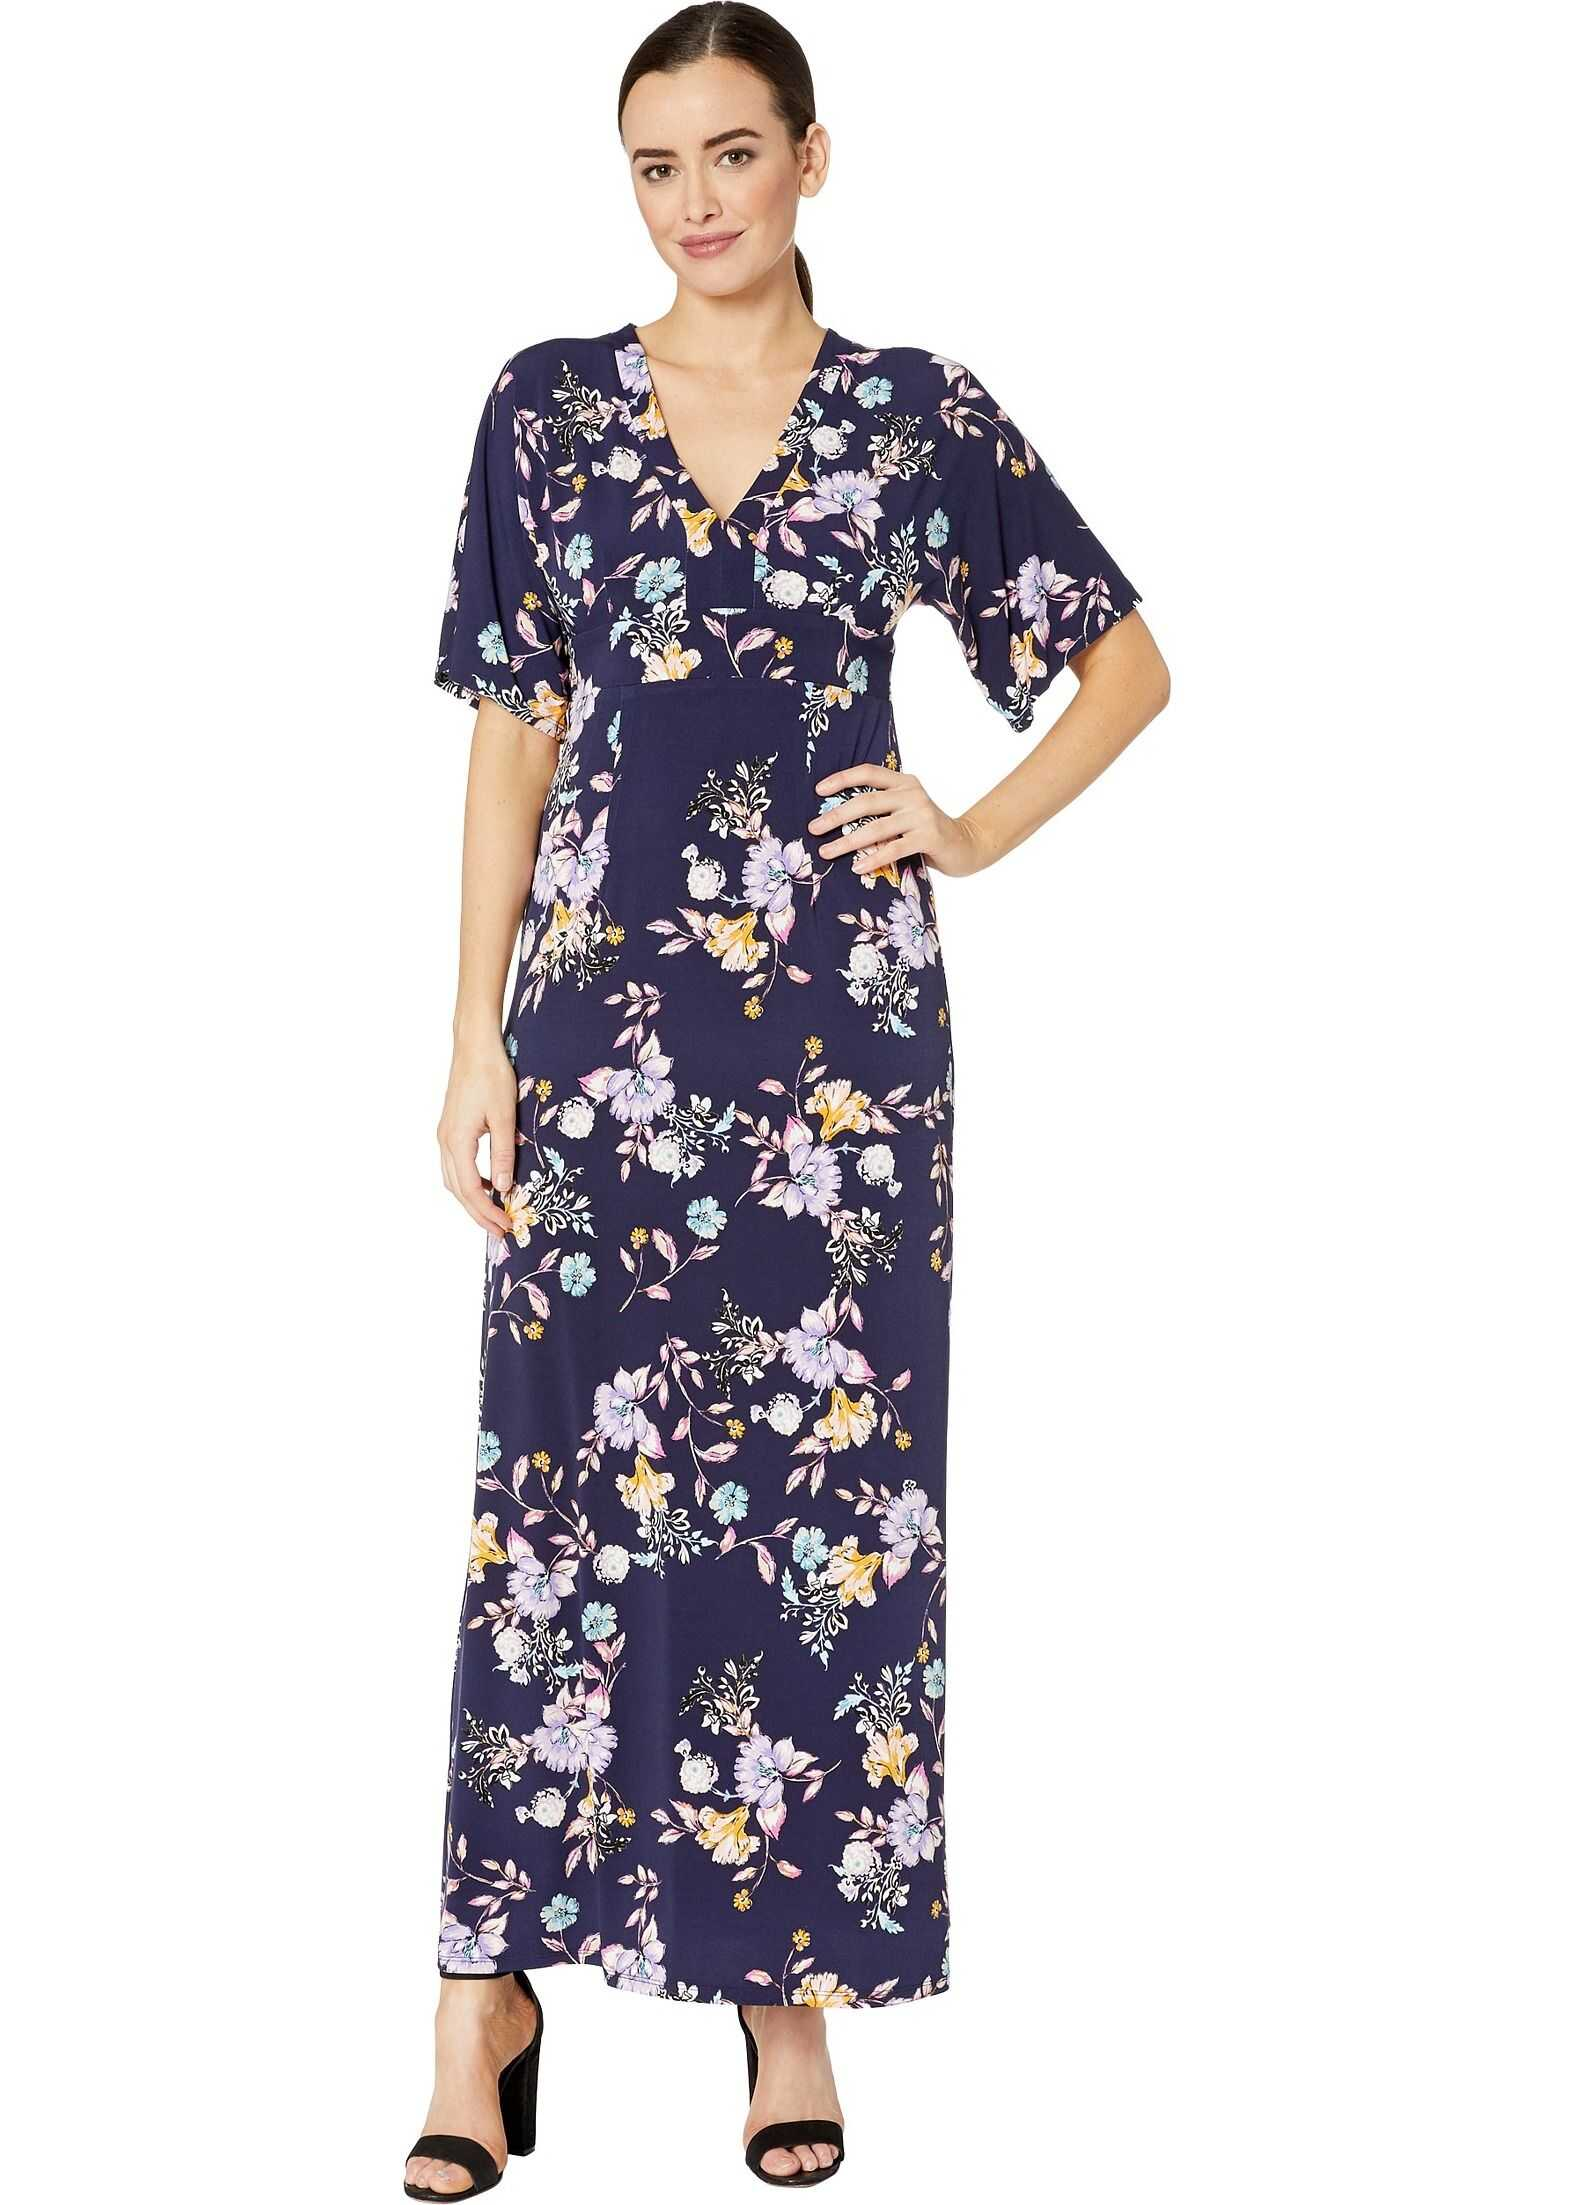 Donna Morgan 3/4 Flutter Sleeve V-Neck Mixed Print Jersey Maxi Dress Navy/Lilac Multi